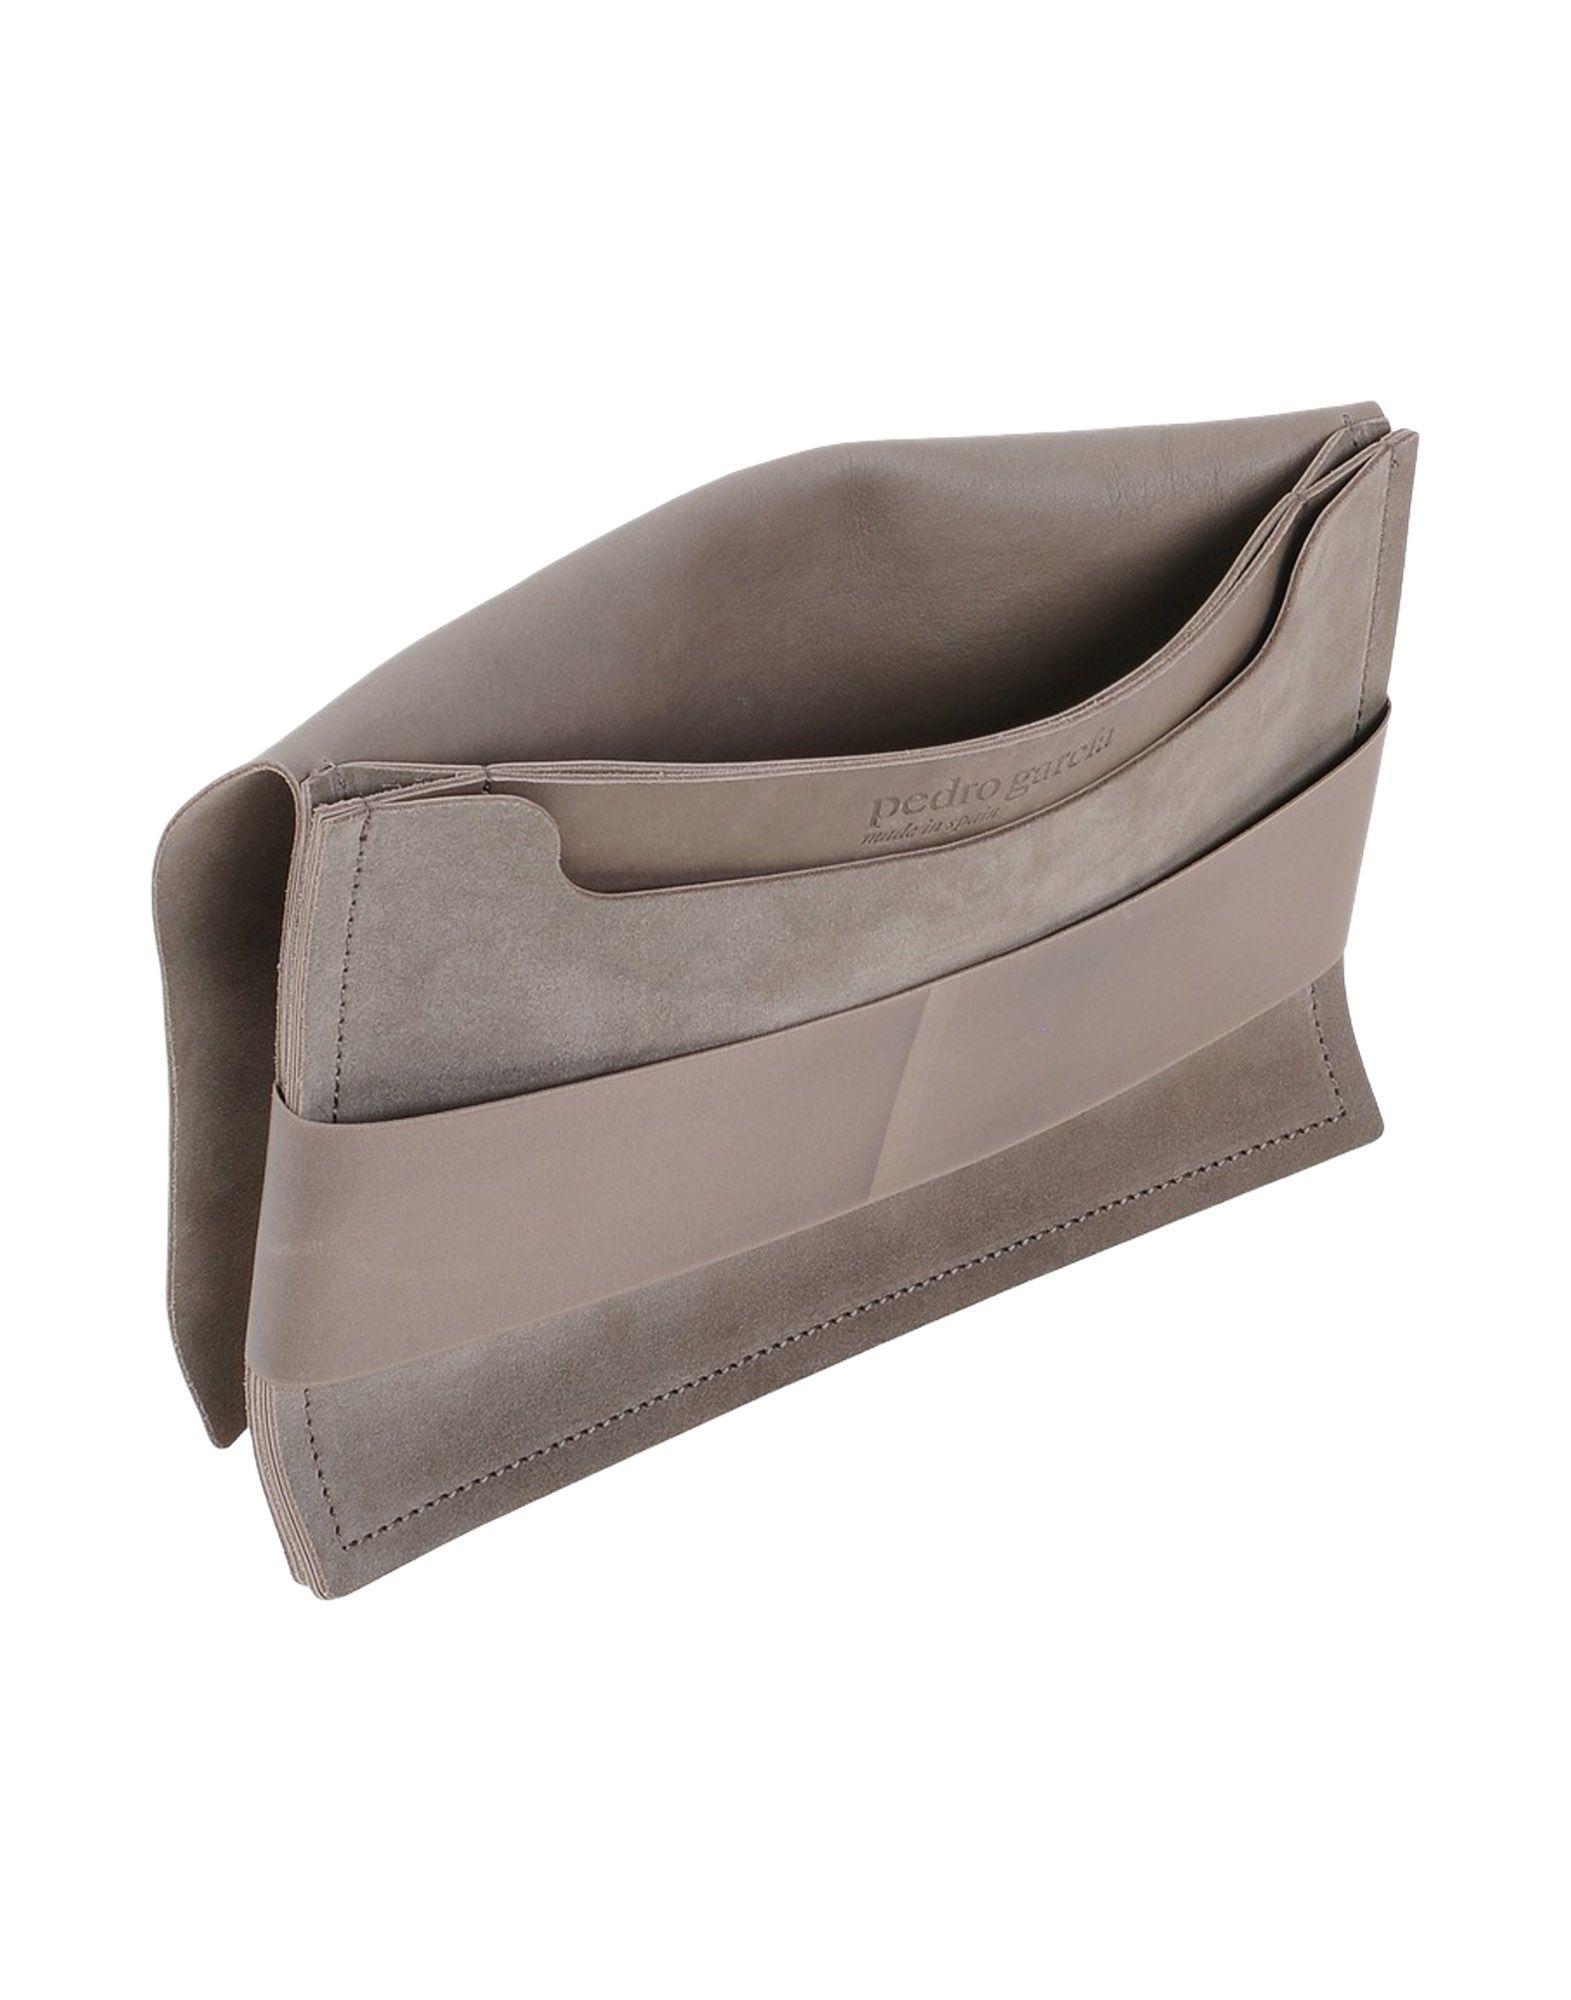 Elegant Zipper Tote Bag  Black  Handbag  Bags  PEDRO